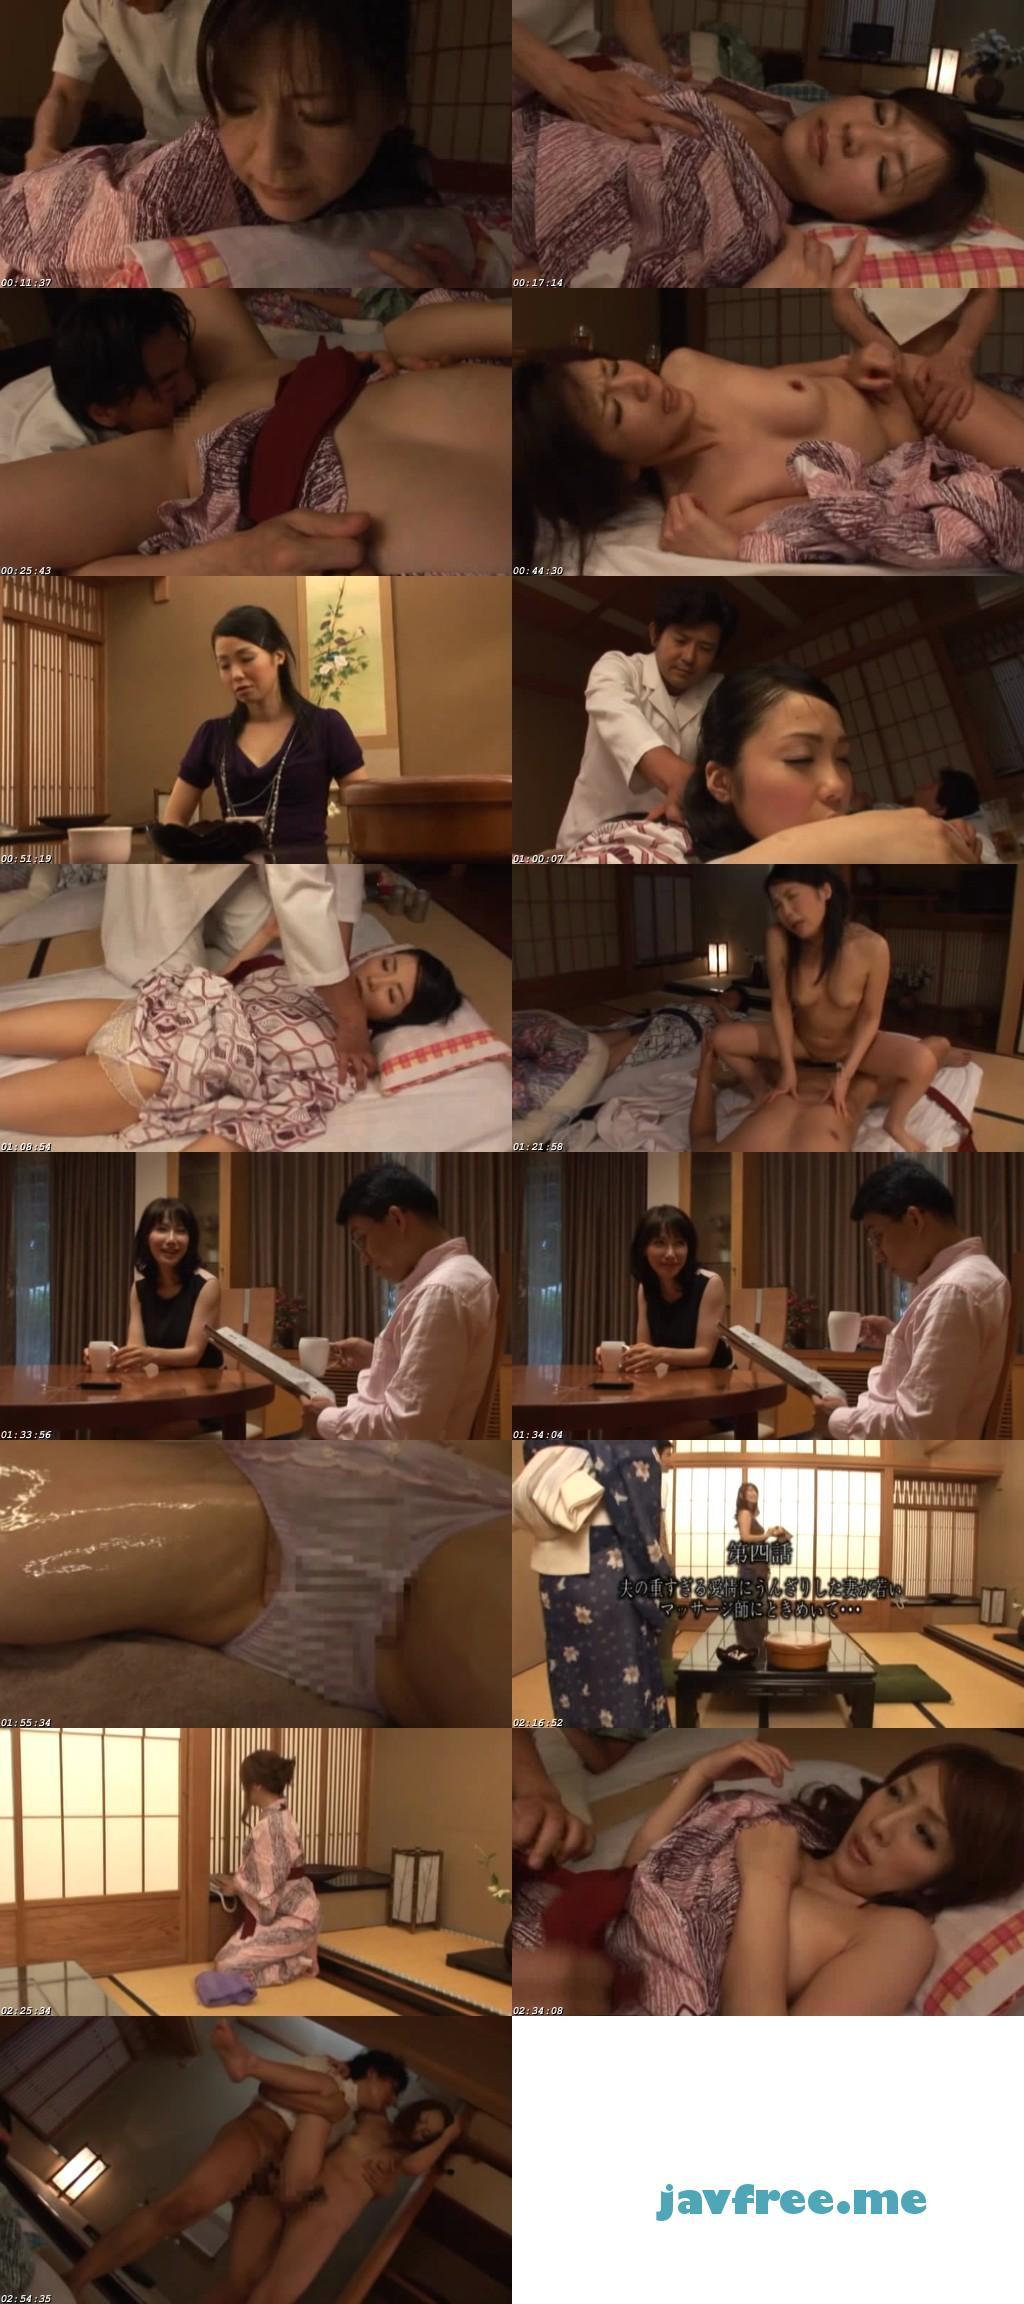 [MAMA 300] 美熟女専門 温泉出張マッサージ 旦那の横で悶える4人の熟女 結城みさ 有沢実紗 折川菜由 上原千尋 MAMA